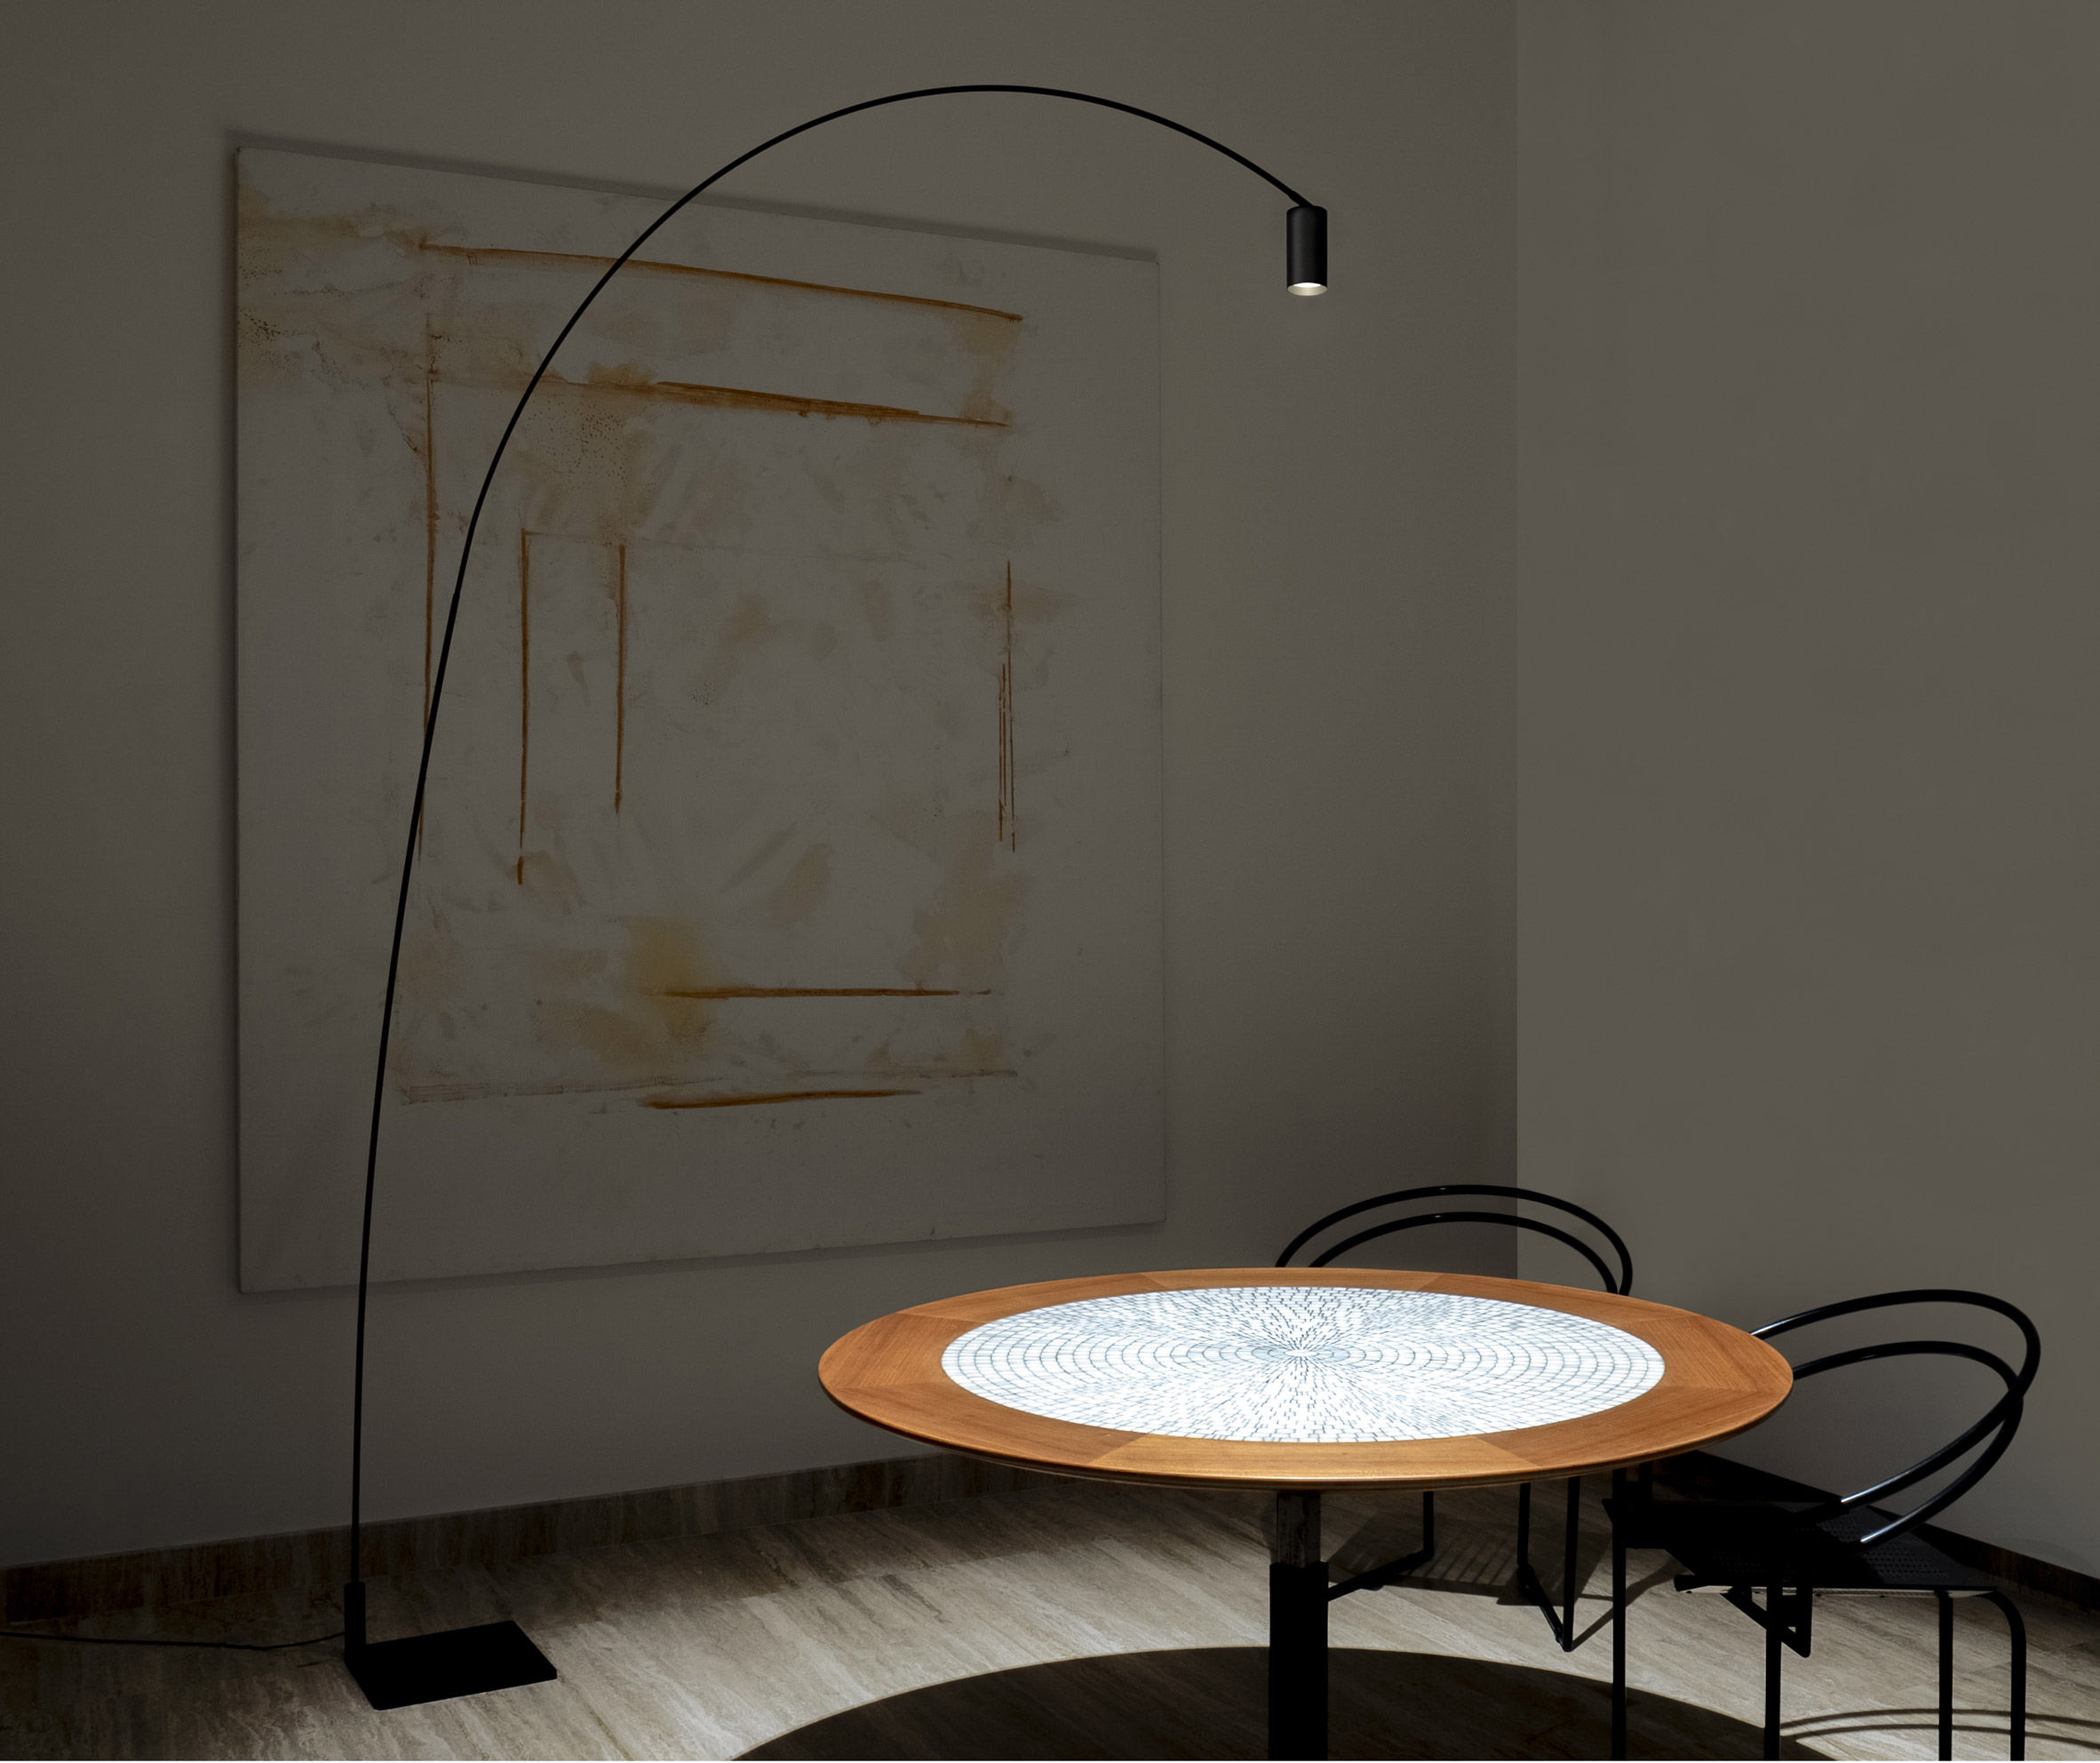 Floor lamp by Bernhard Osann in an interior